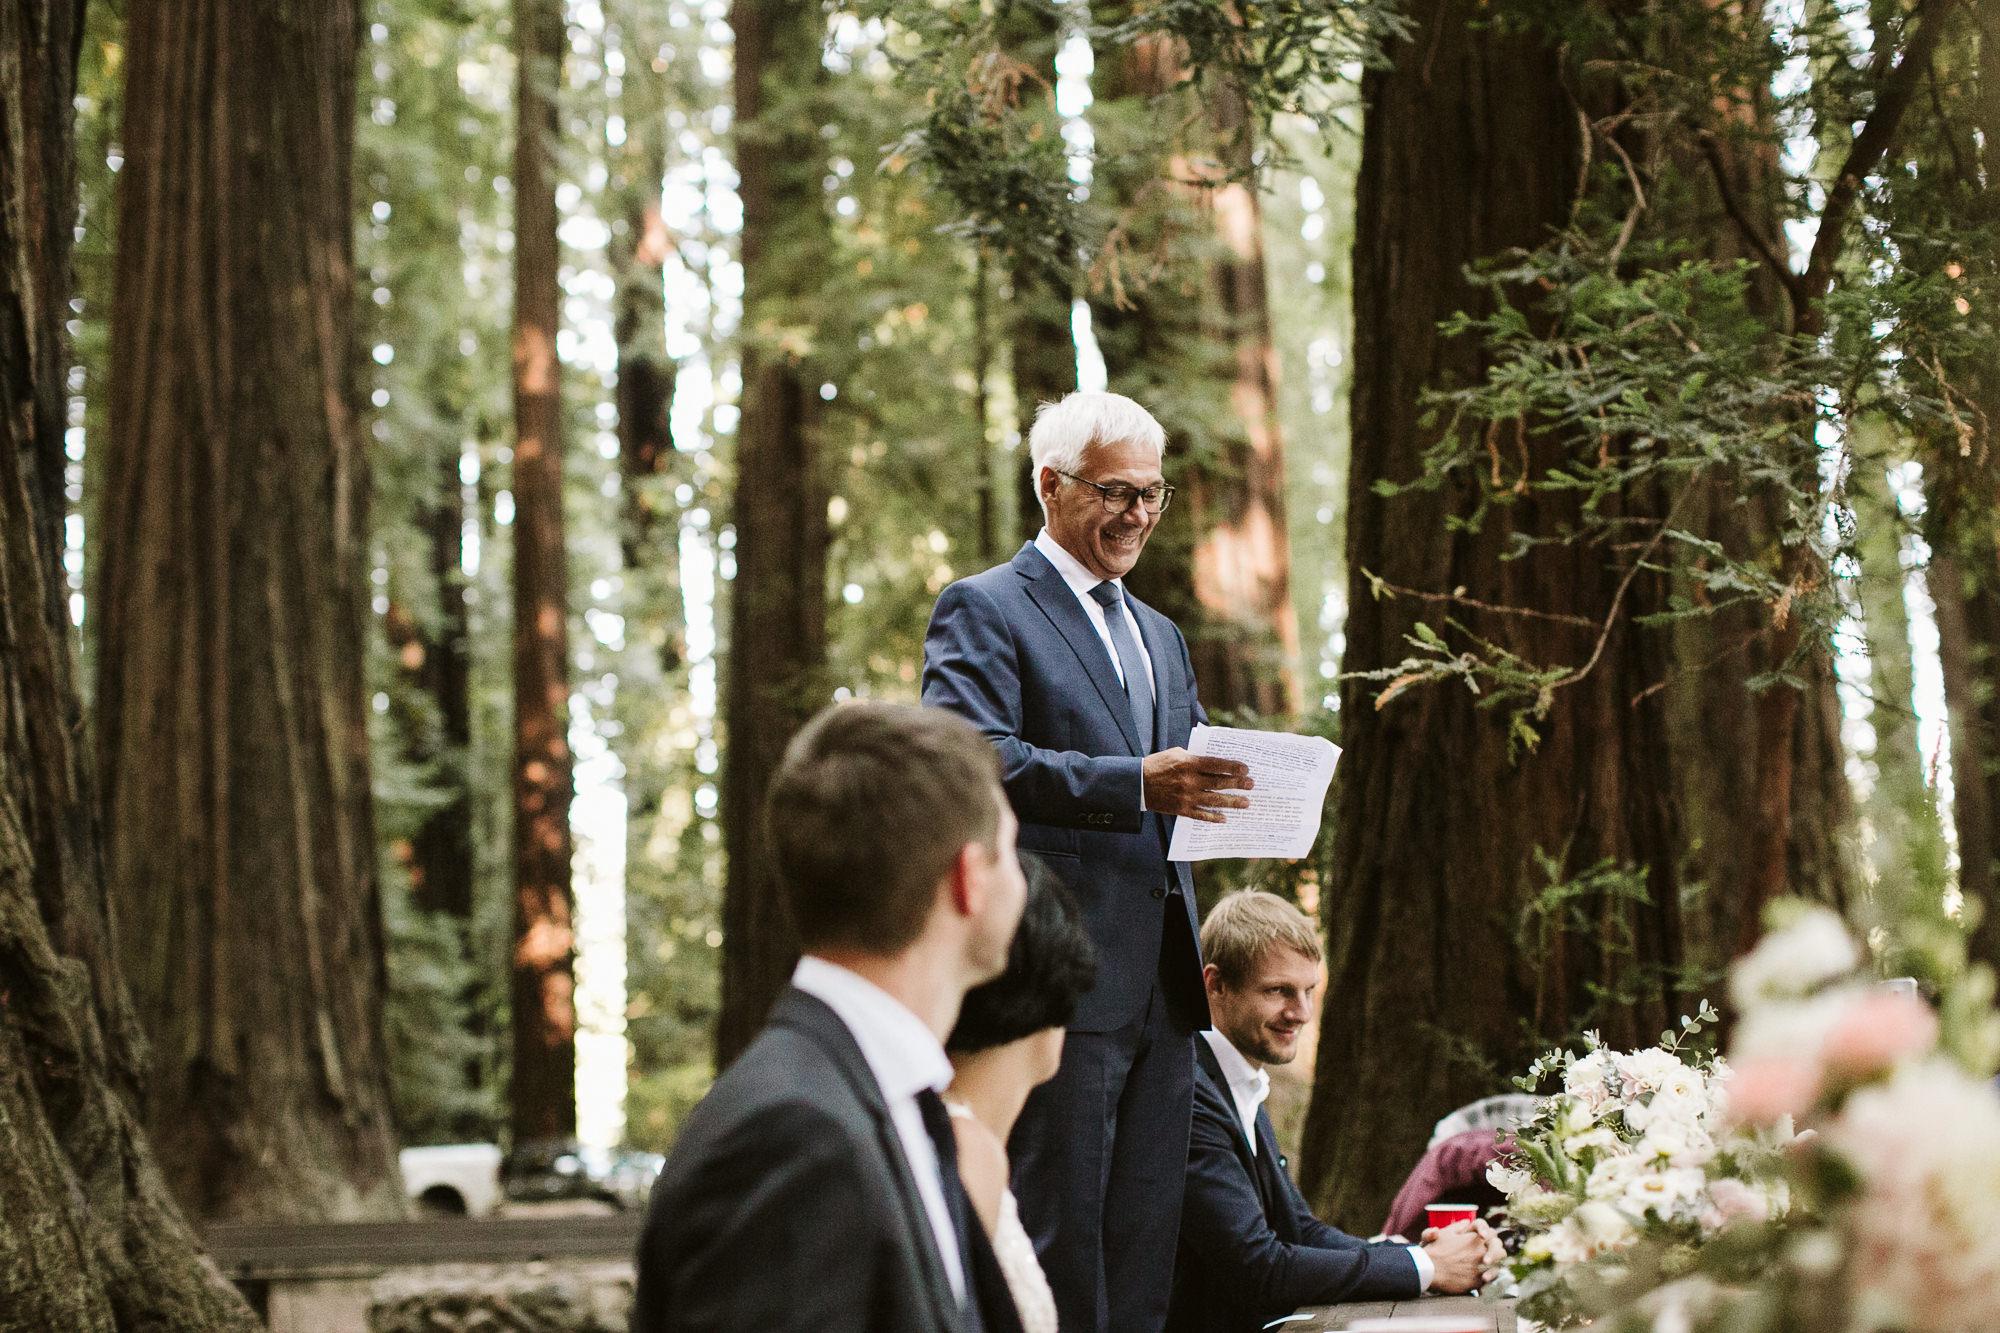 California-wedding-photographer-alfonso-flores-pamplin-groove-316.jpg